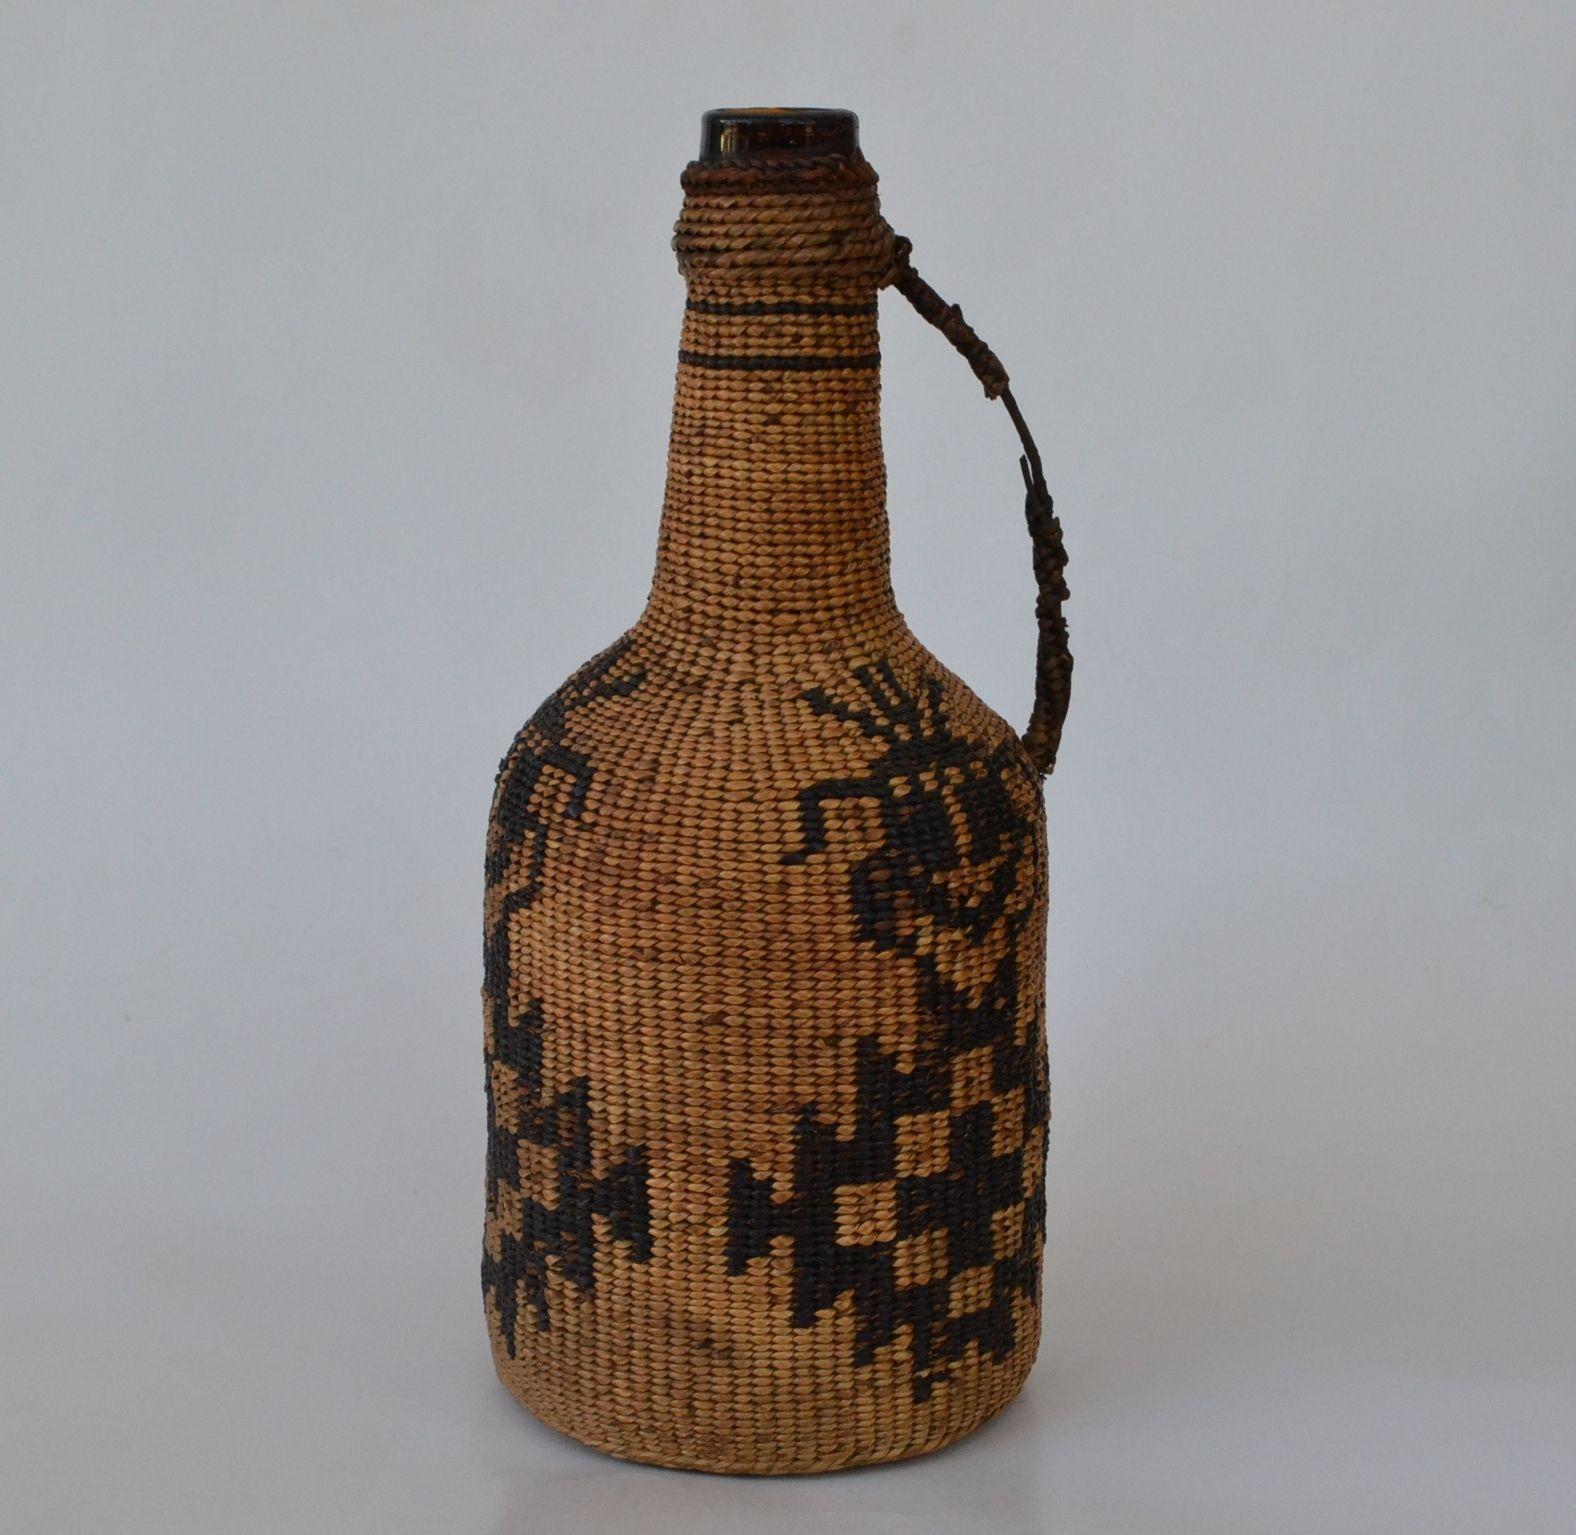 pit river hat creek bottle native american art